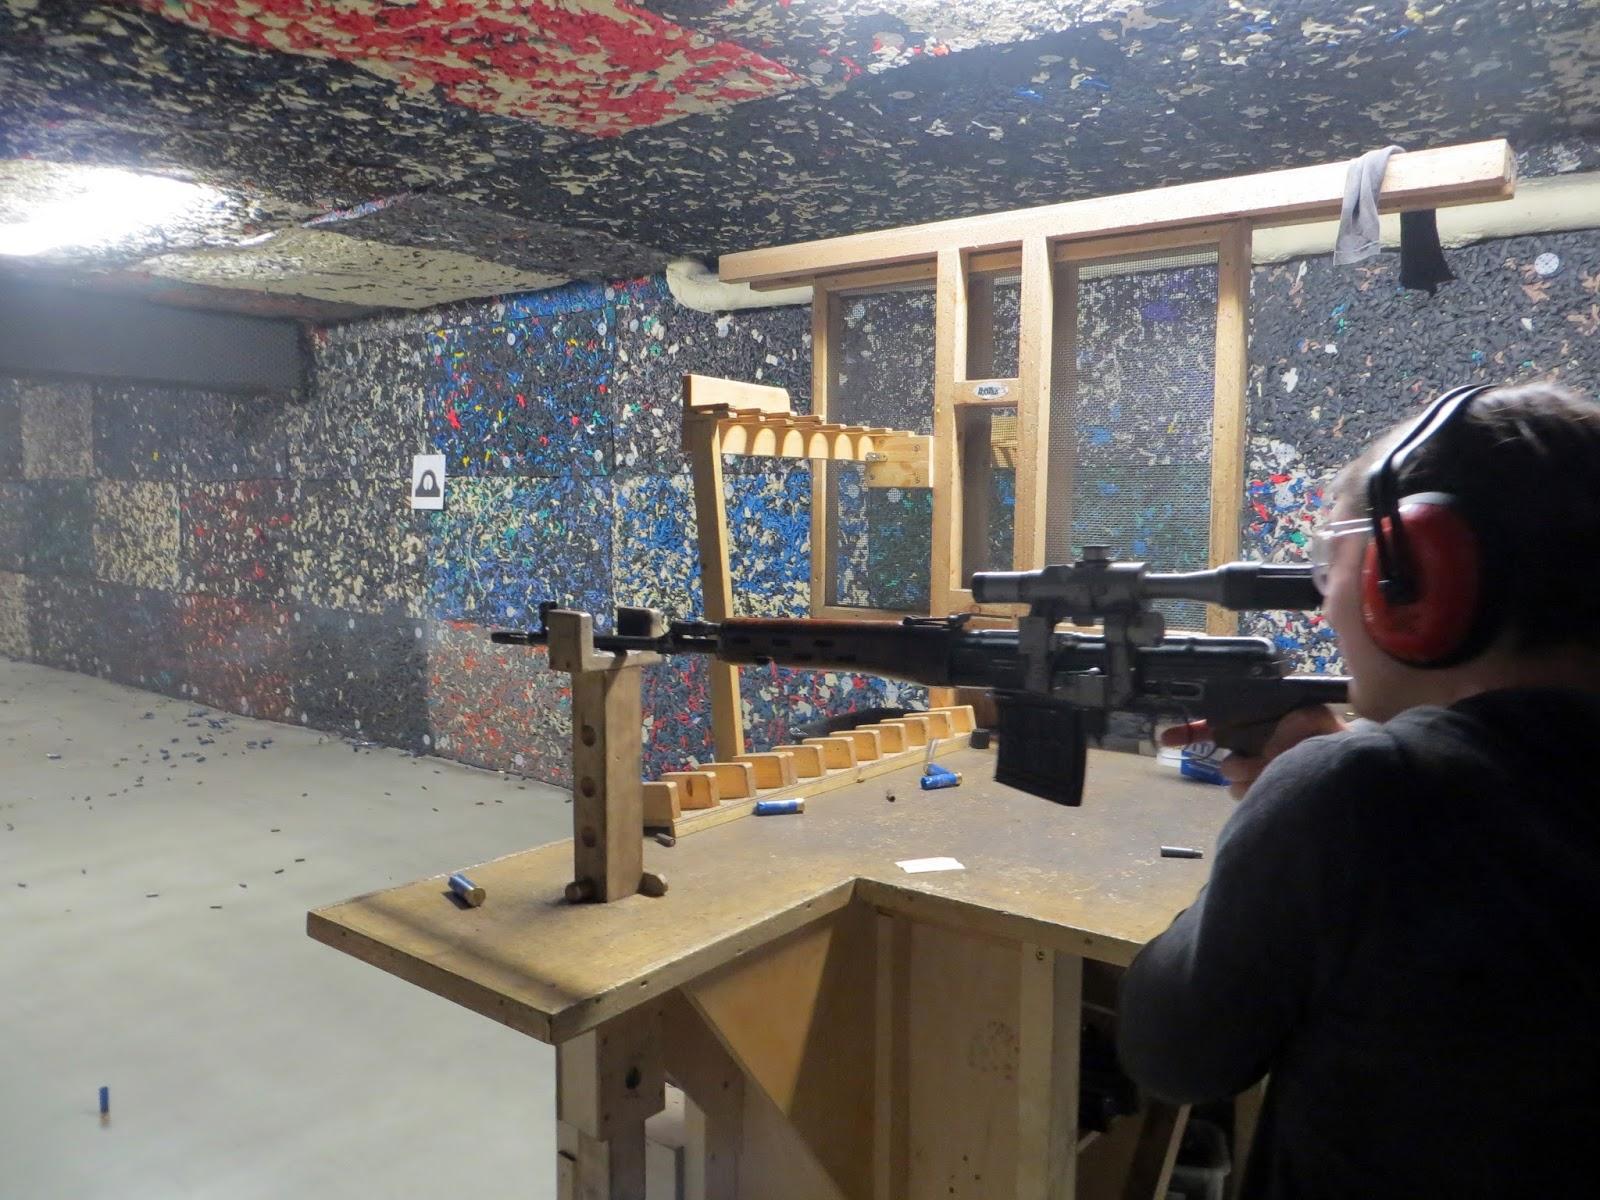 sniper rifle, shotgun, Celeritas shooting club, pistol, rifle, revolver, shooting, range, guns, firing, ak47, desert eagle, budapest, hungary, travel,